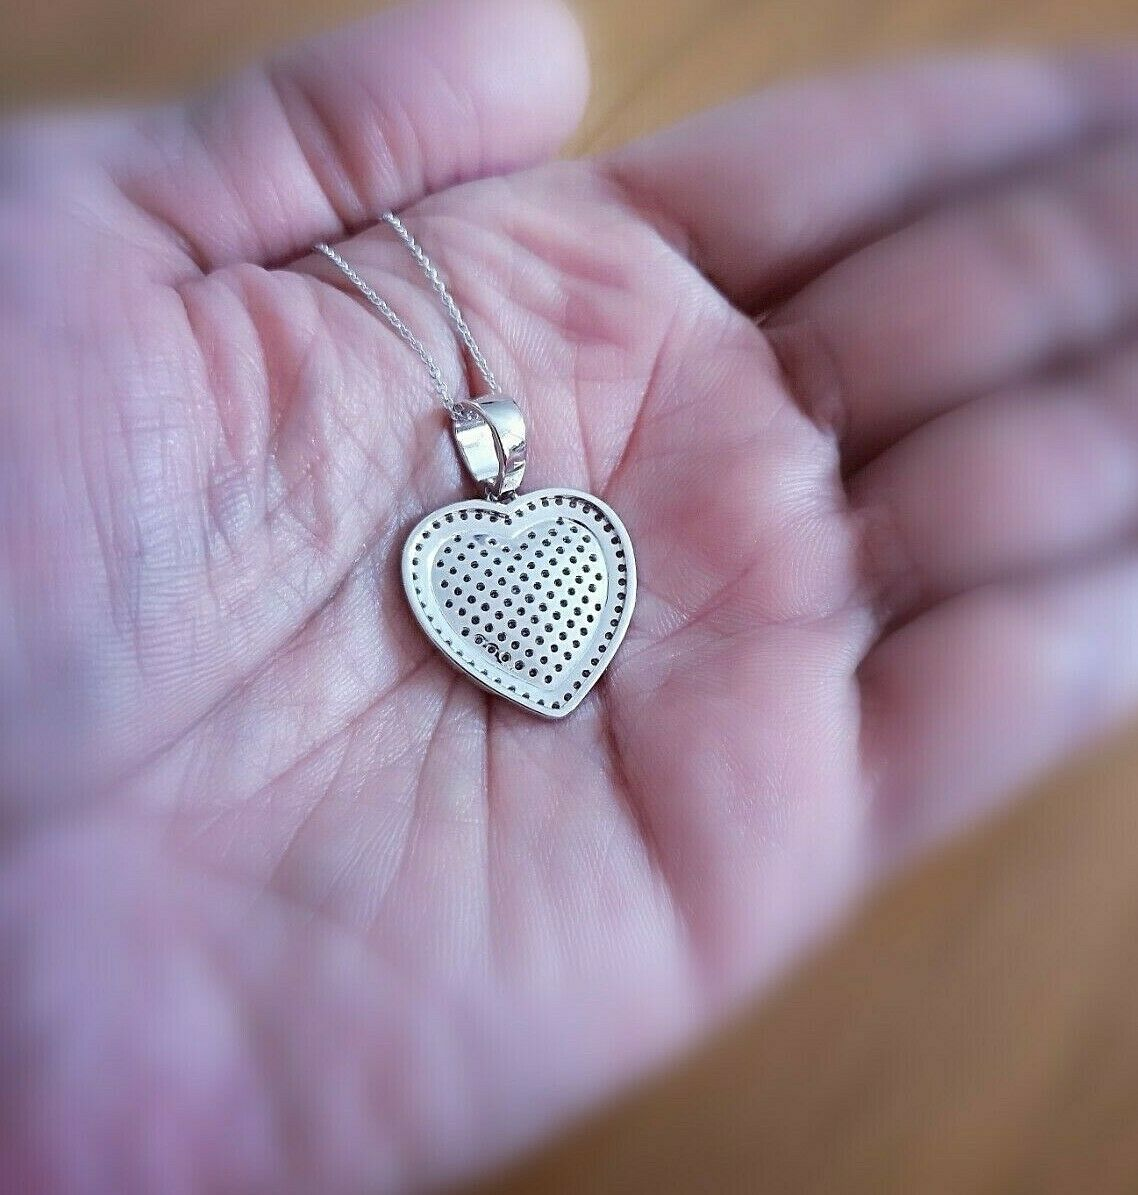 1 Ct Diamond pendant with Chain Woman's Heart Diamond Necklace 14K White Gold 2